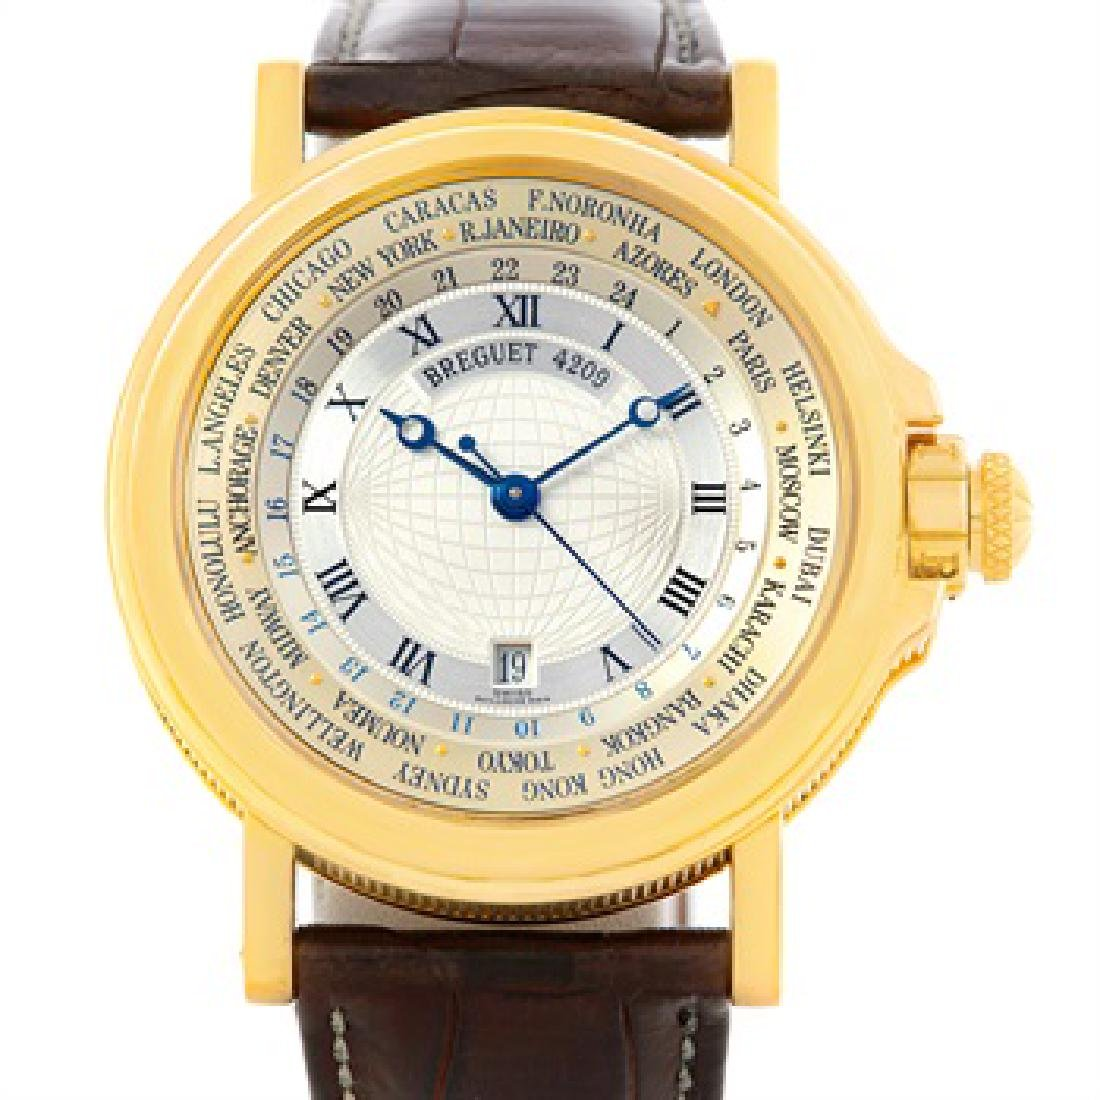 Breguet Marine World Time Hora Mundi 18K Yellow Gold